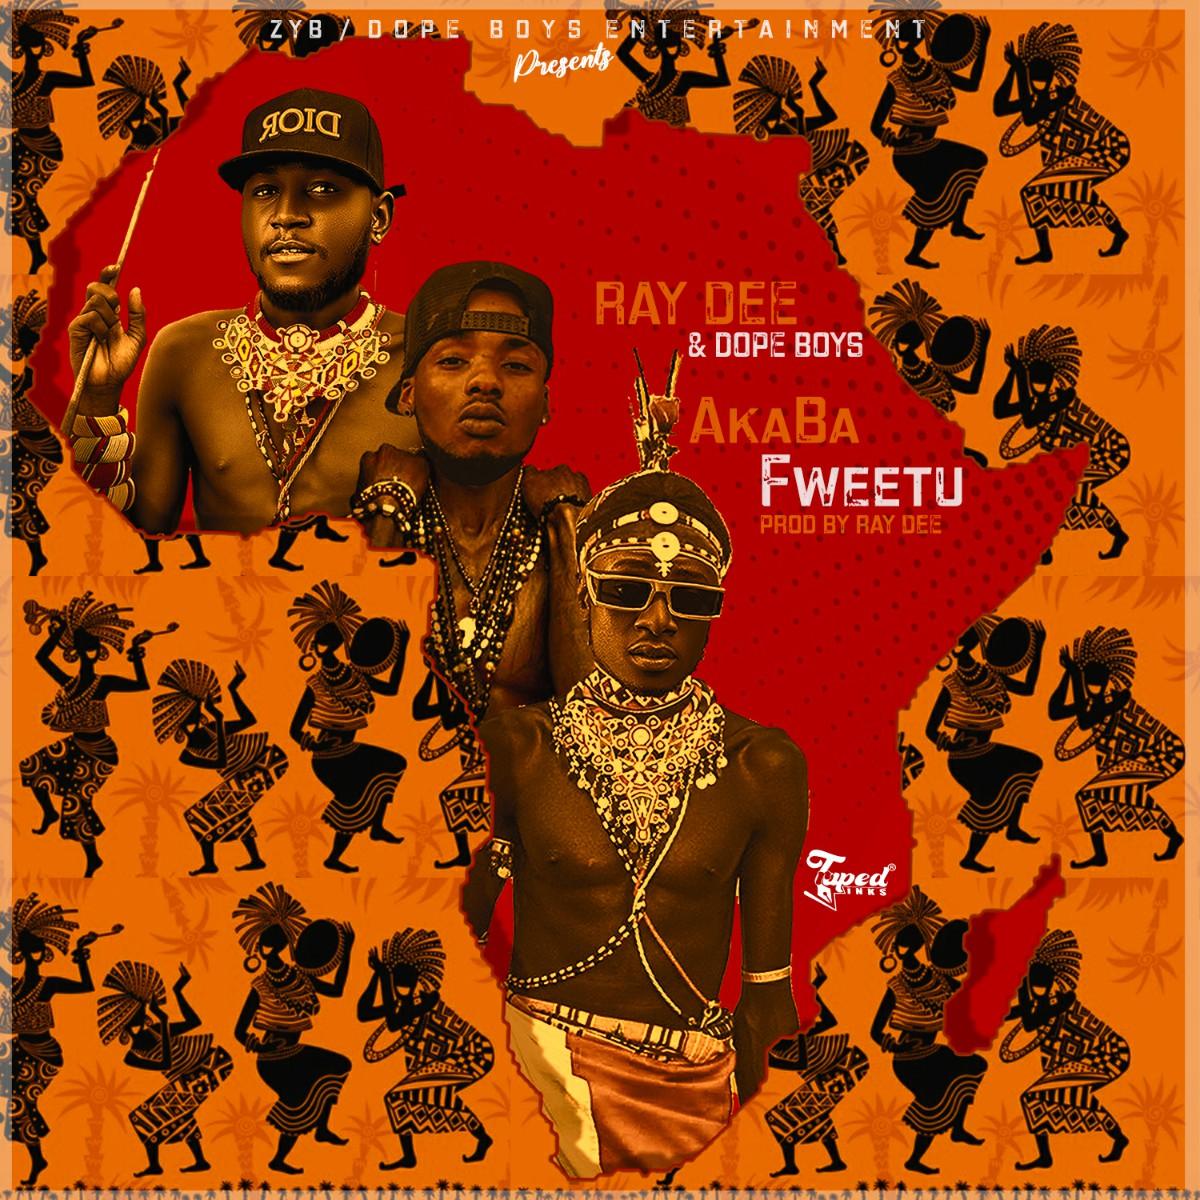 Ray Dee & Dope Boys - Akaba Fwetu